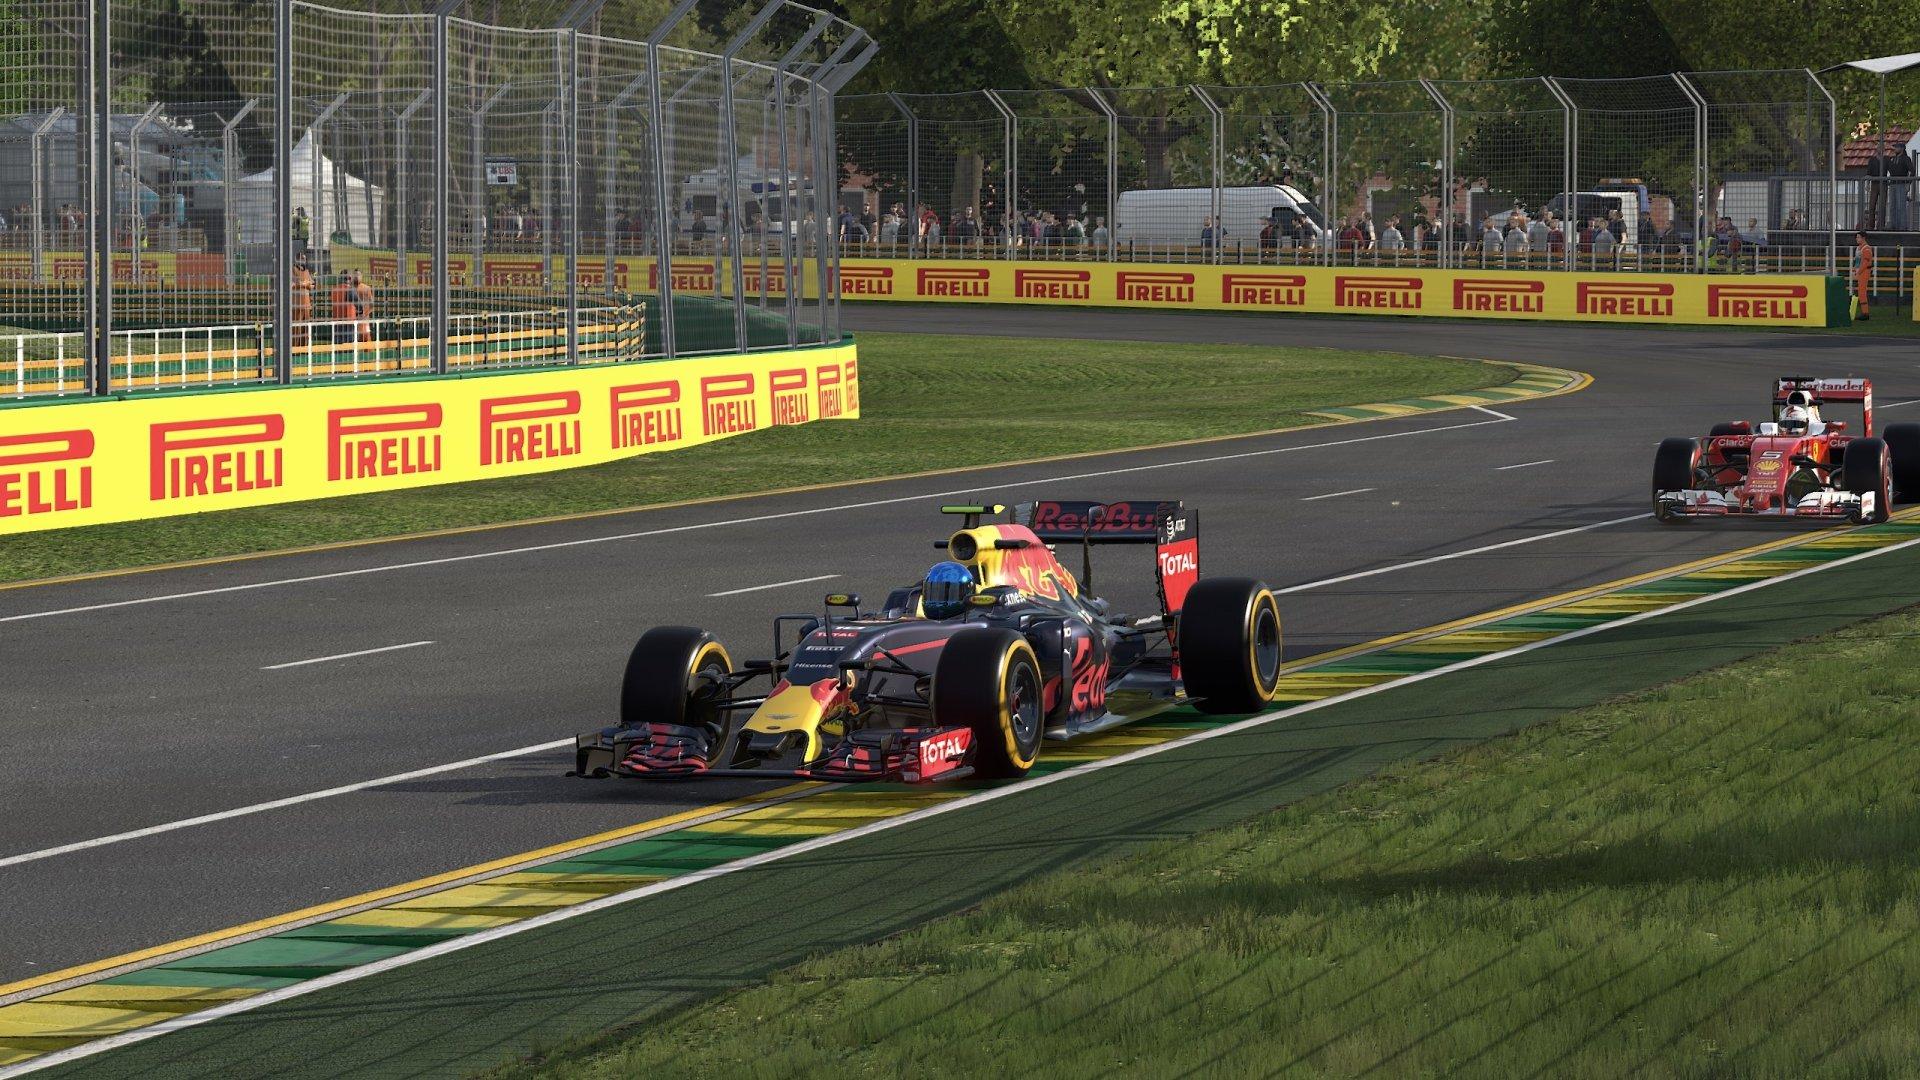 Video Game - F1 2016  Formula 1 Wallpaper